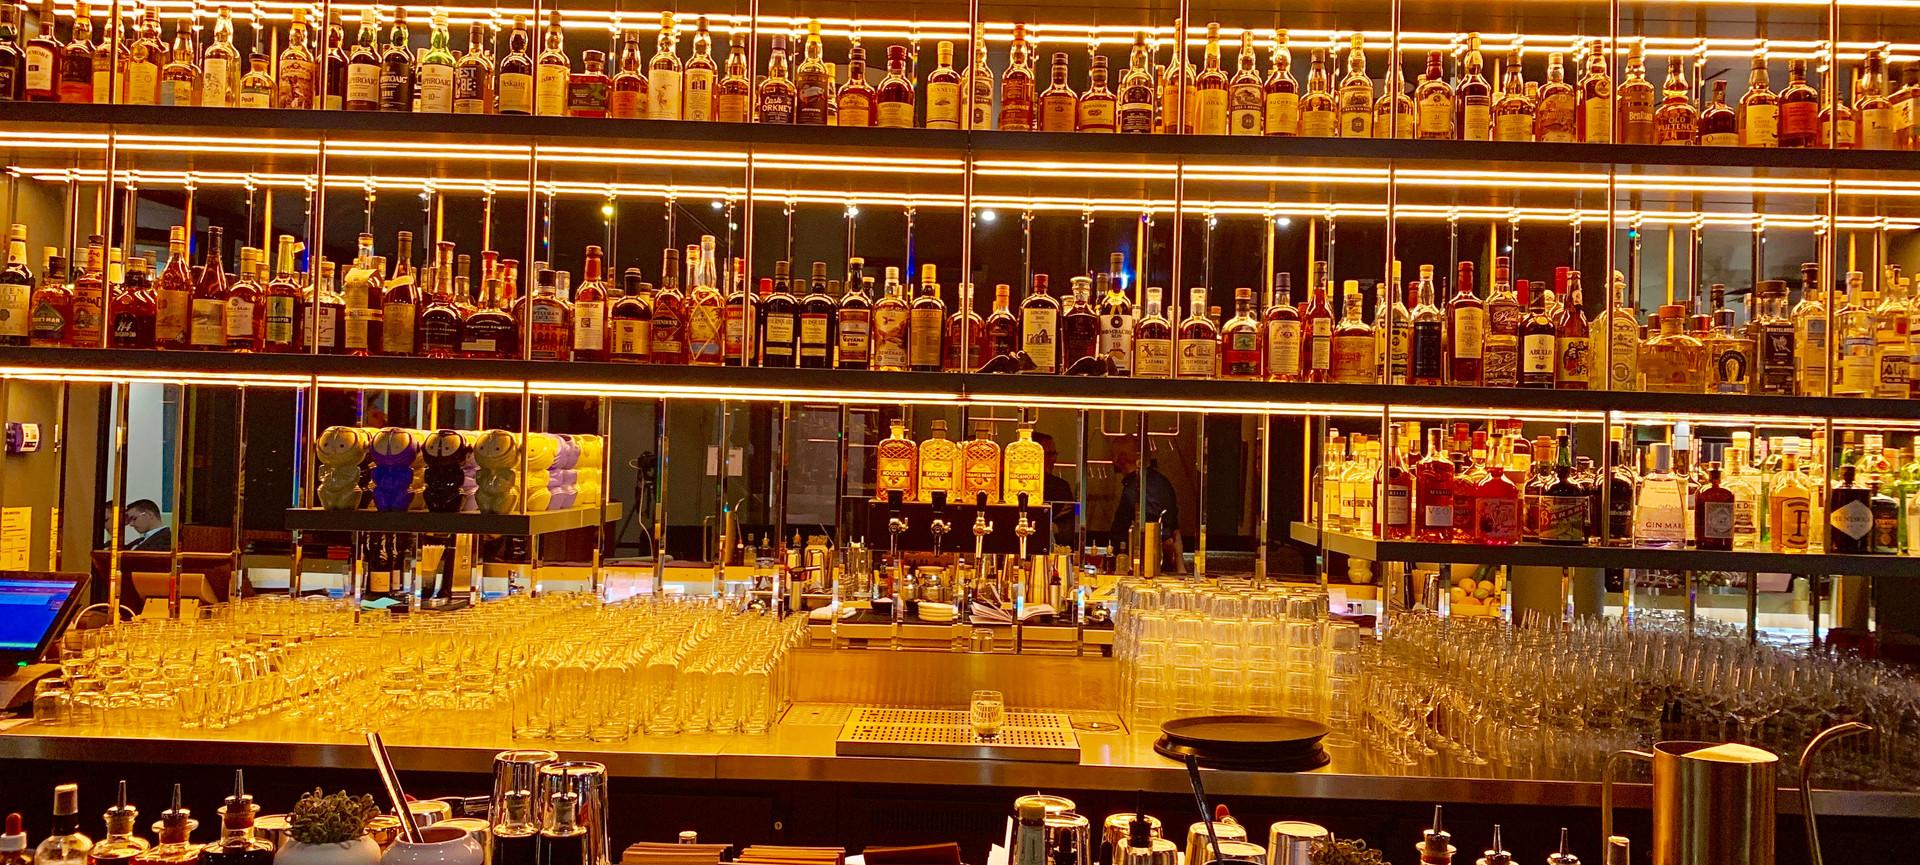 Mio Hotel Amano Bar